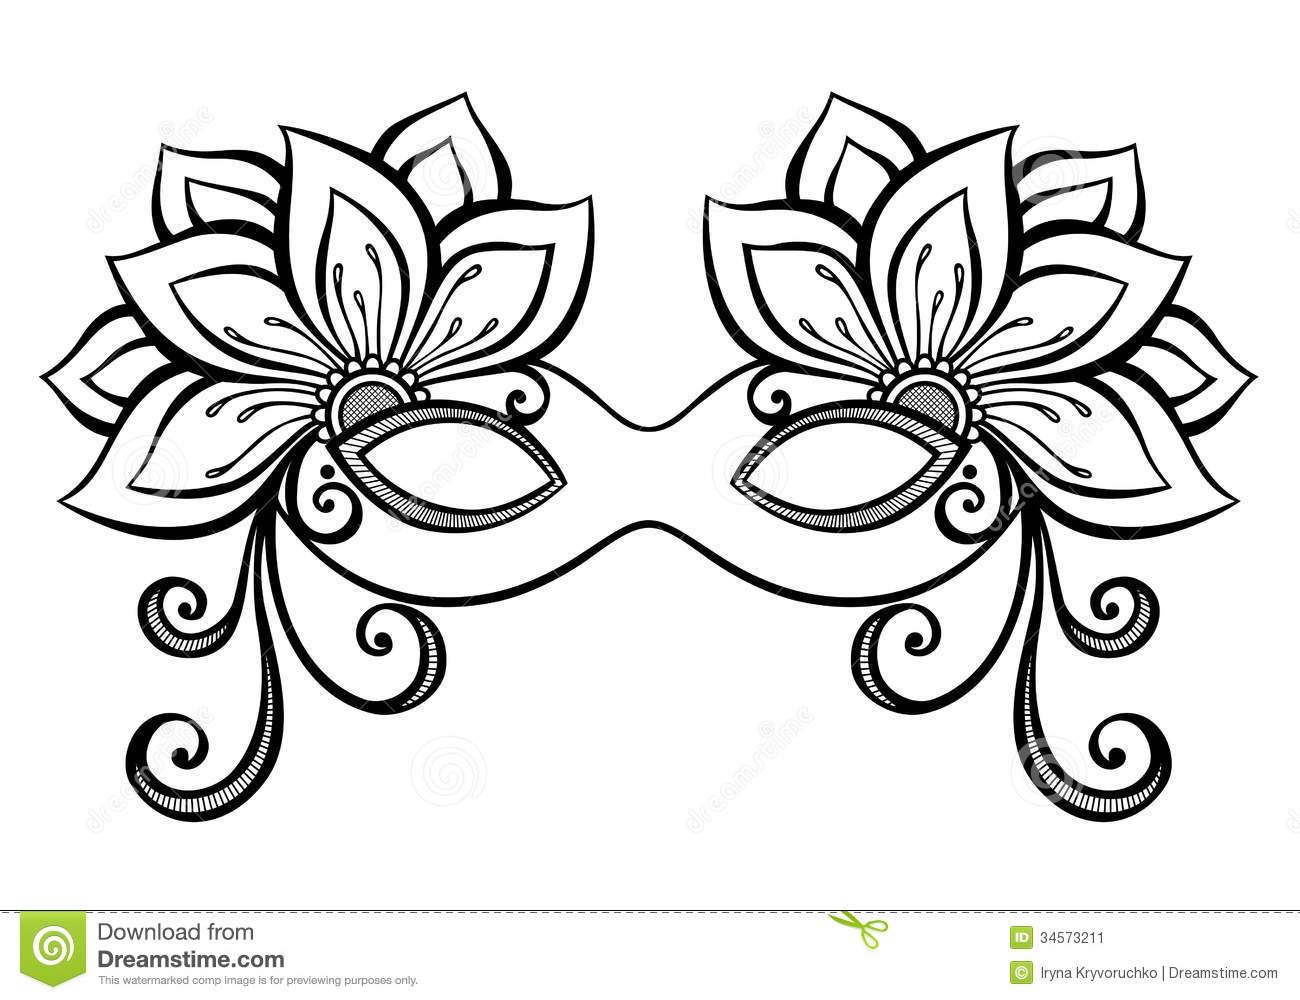 Masquerade clipart prom Download coloring Masquerade drawings Masquerade